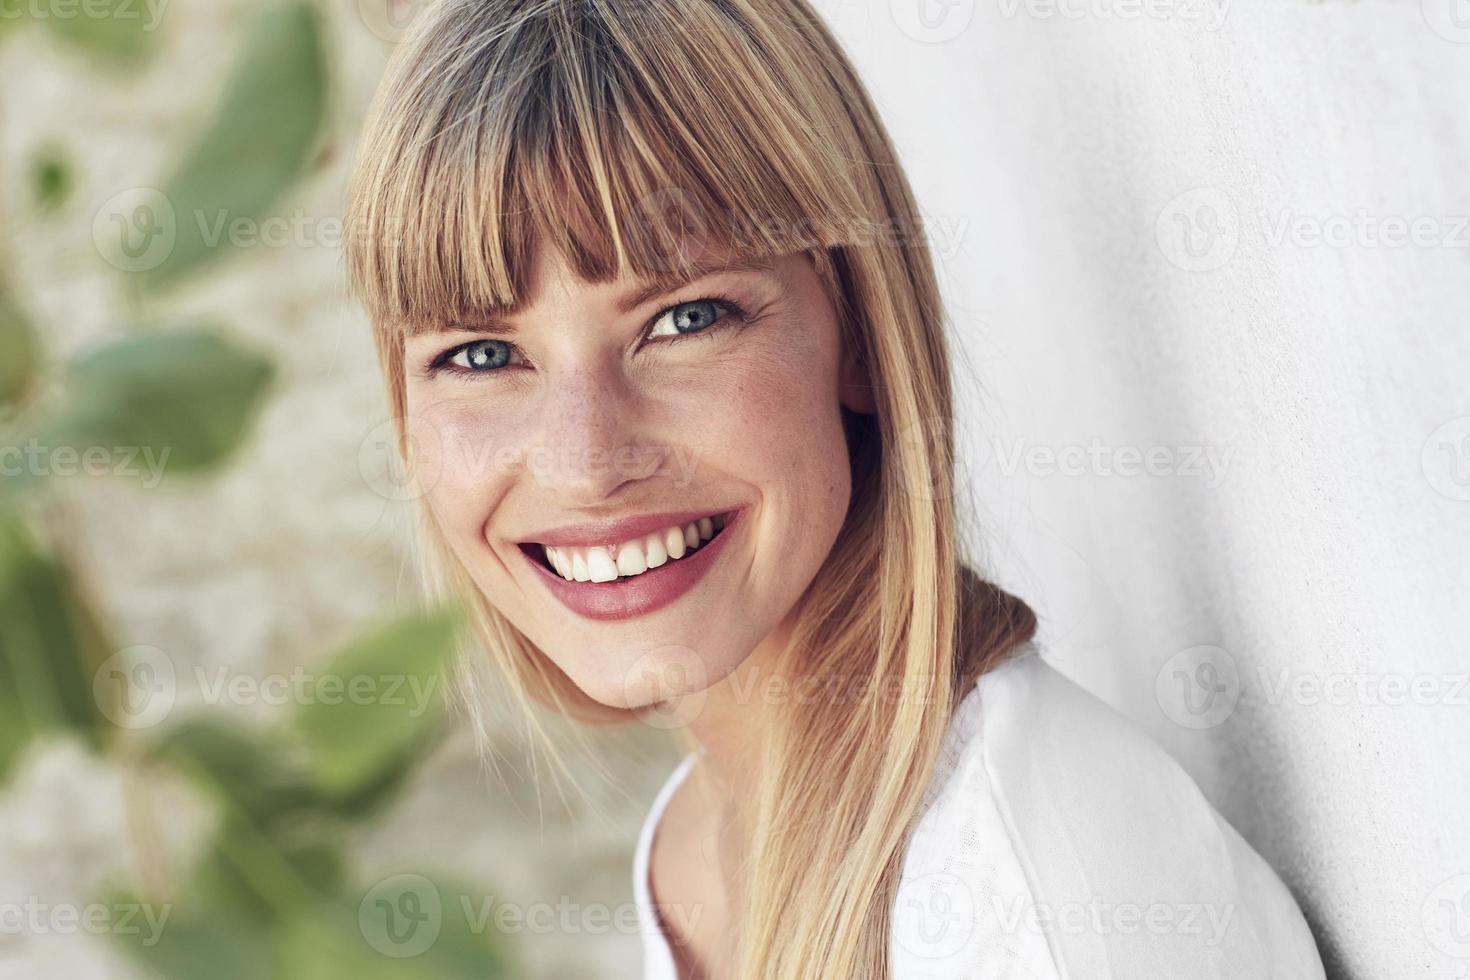 vreugdevolle jonge vrouw portret foto